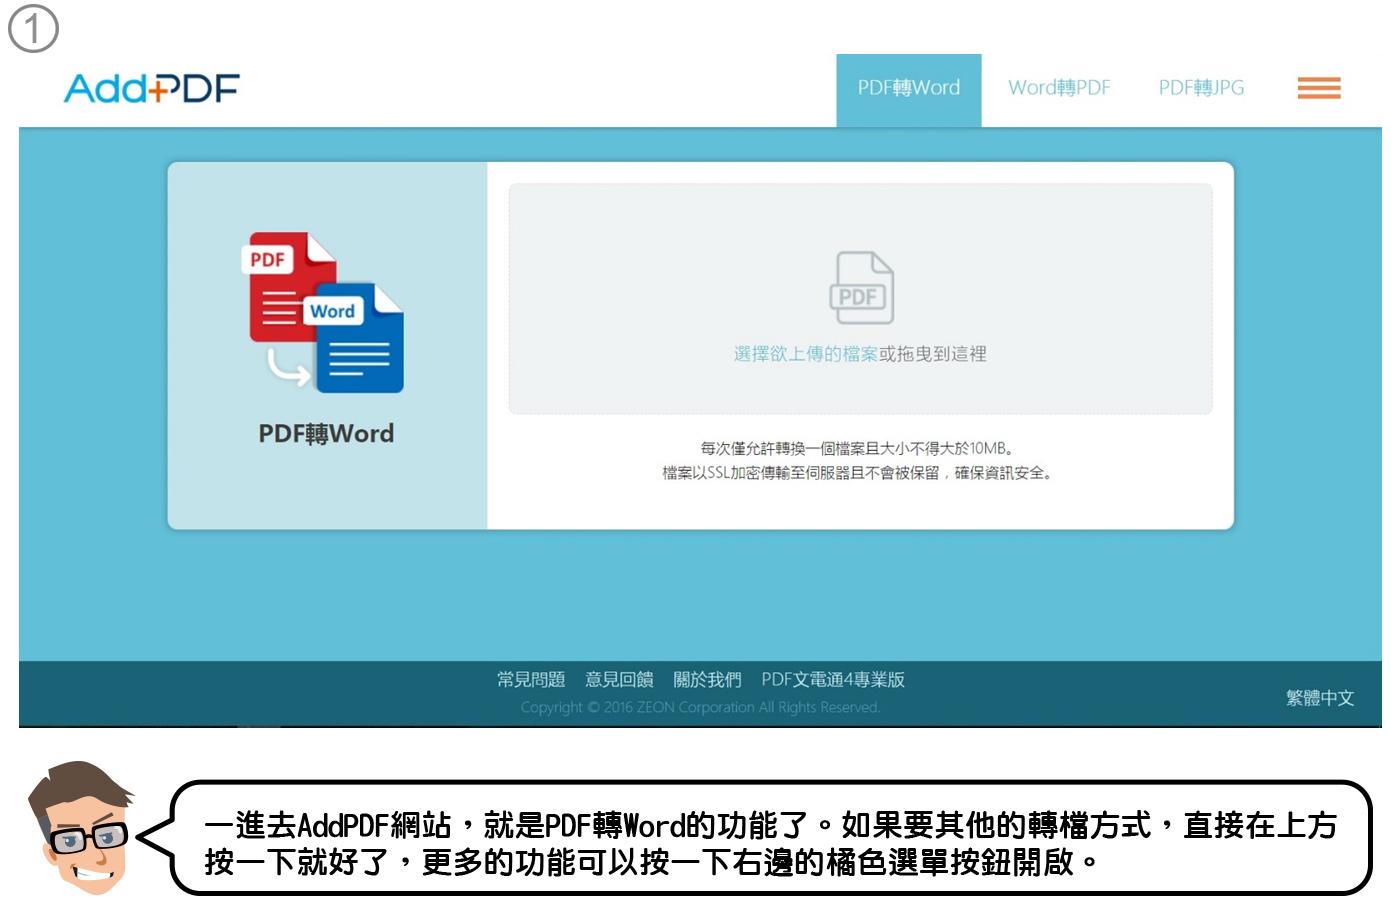 一進去AddPDF網站,就是PDF轉Word的功能了。